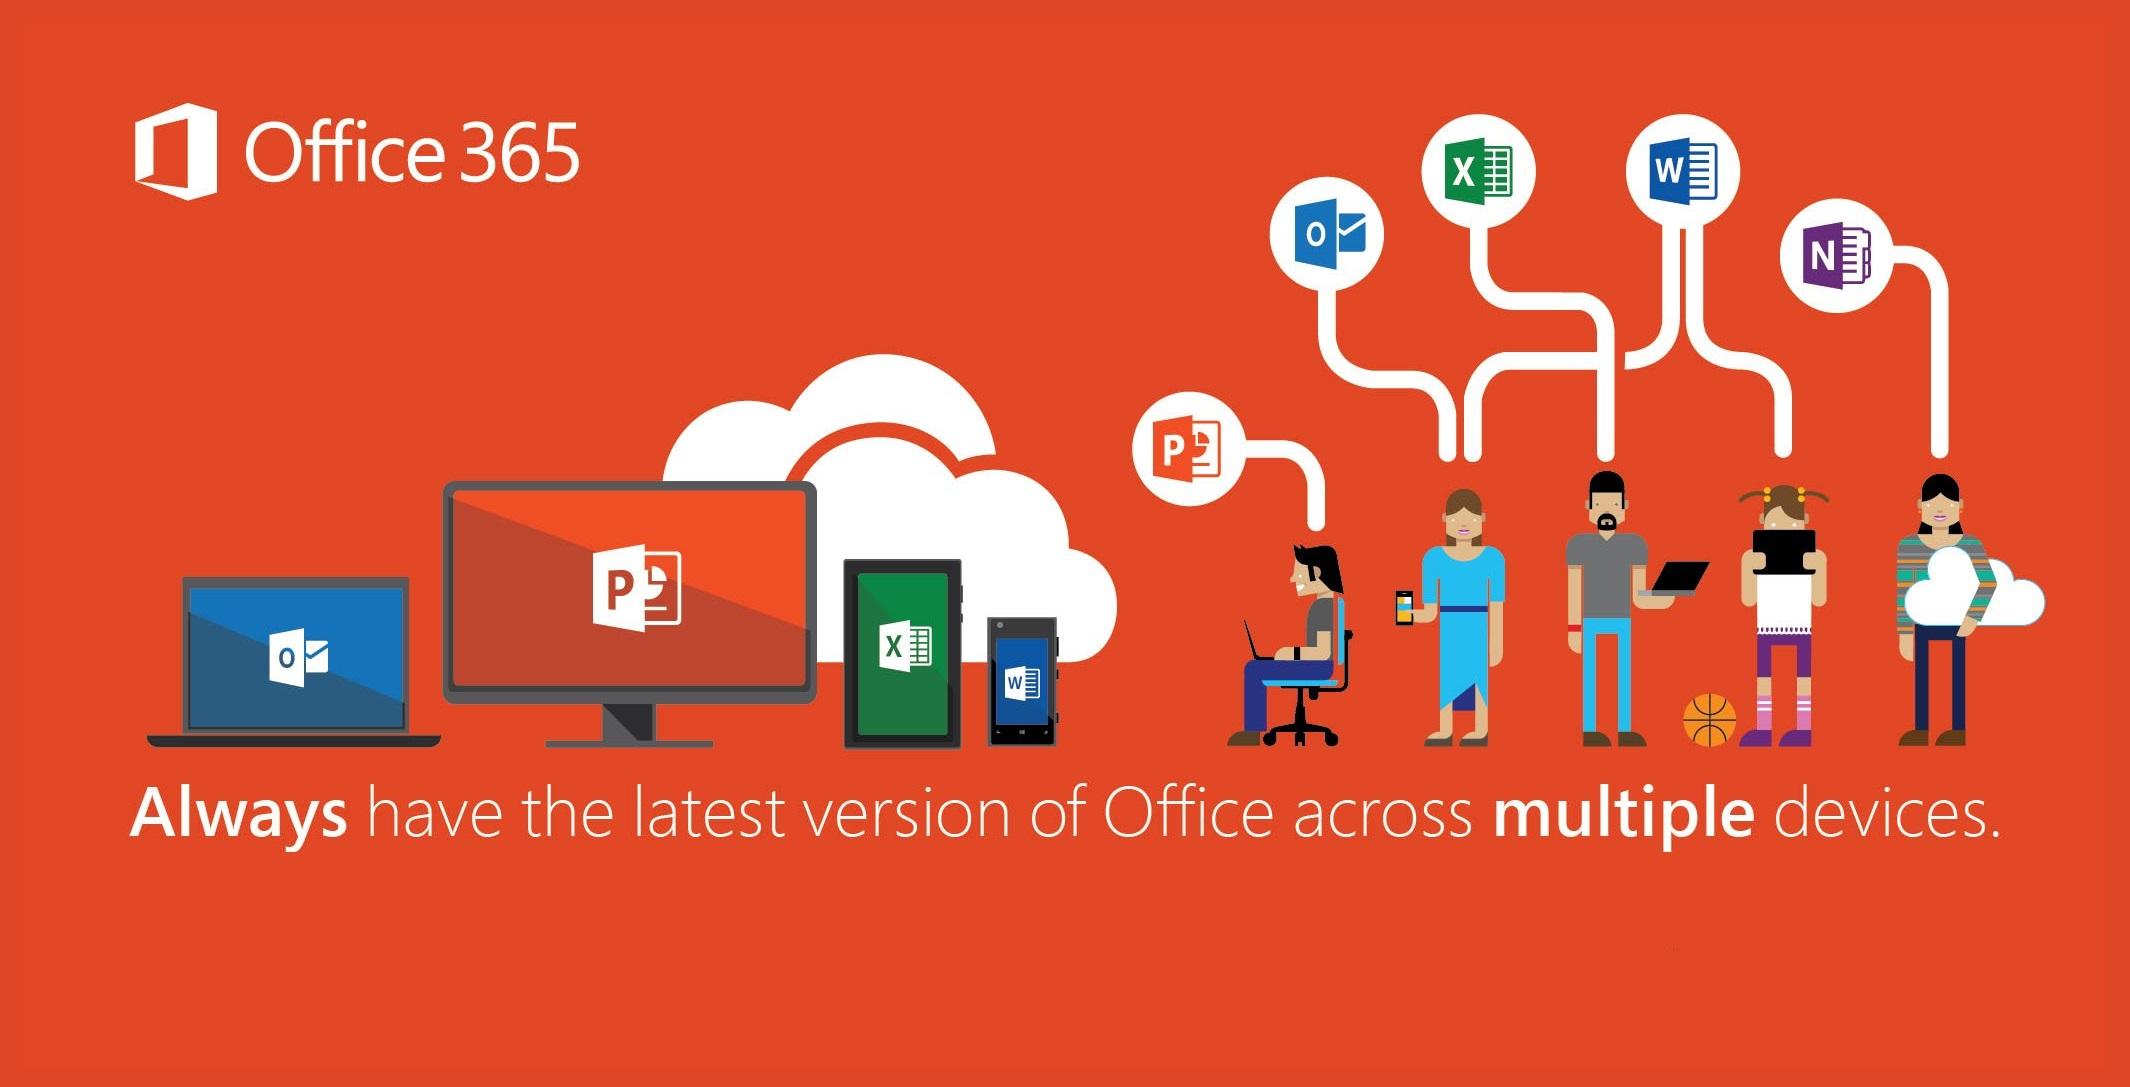 office 365, office, microsoft